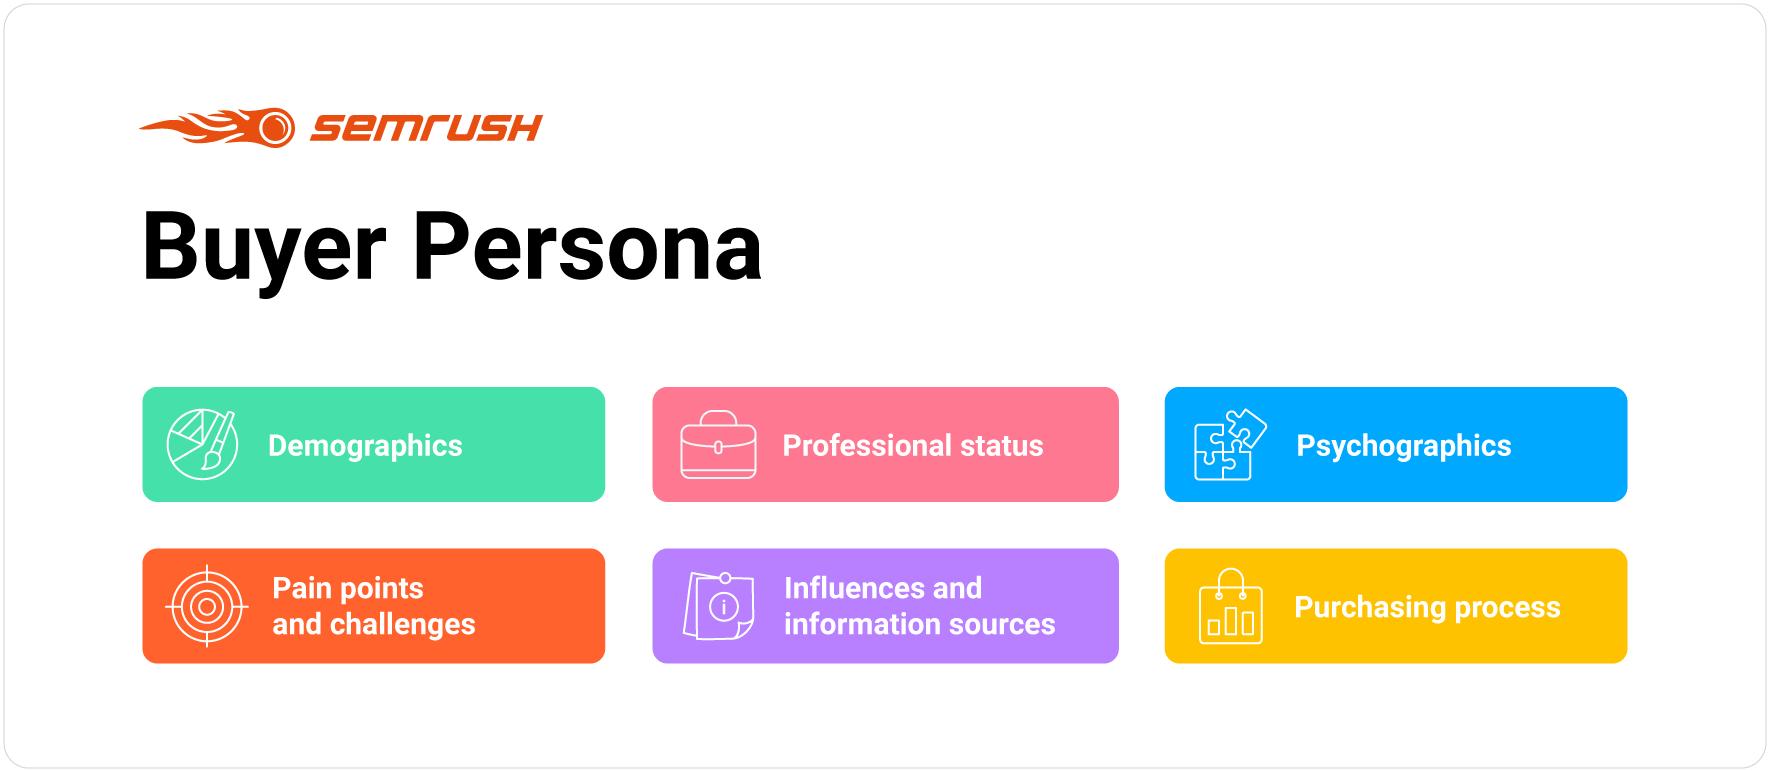 Buyer Persona Characteristics